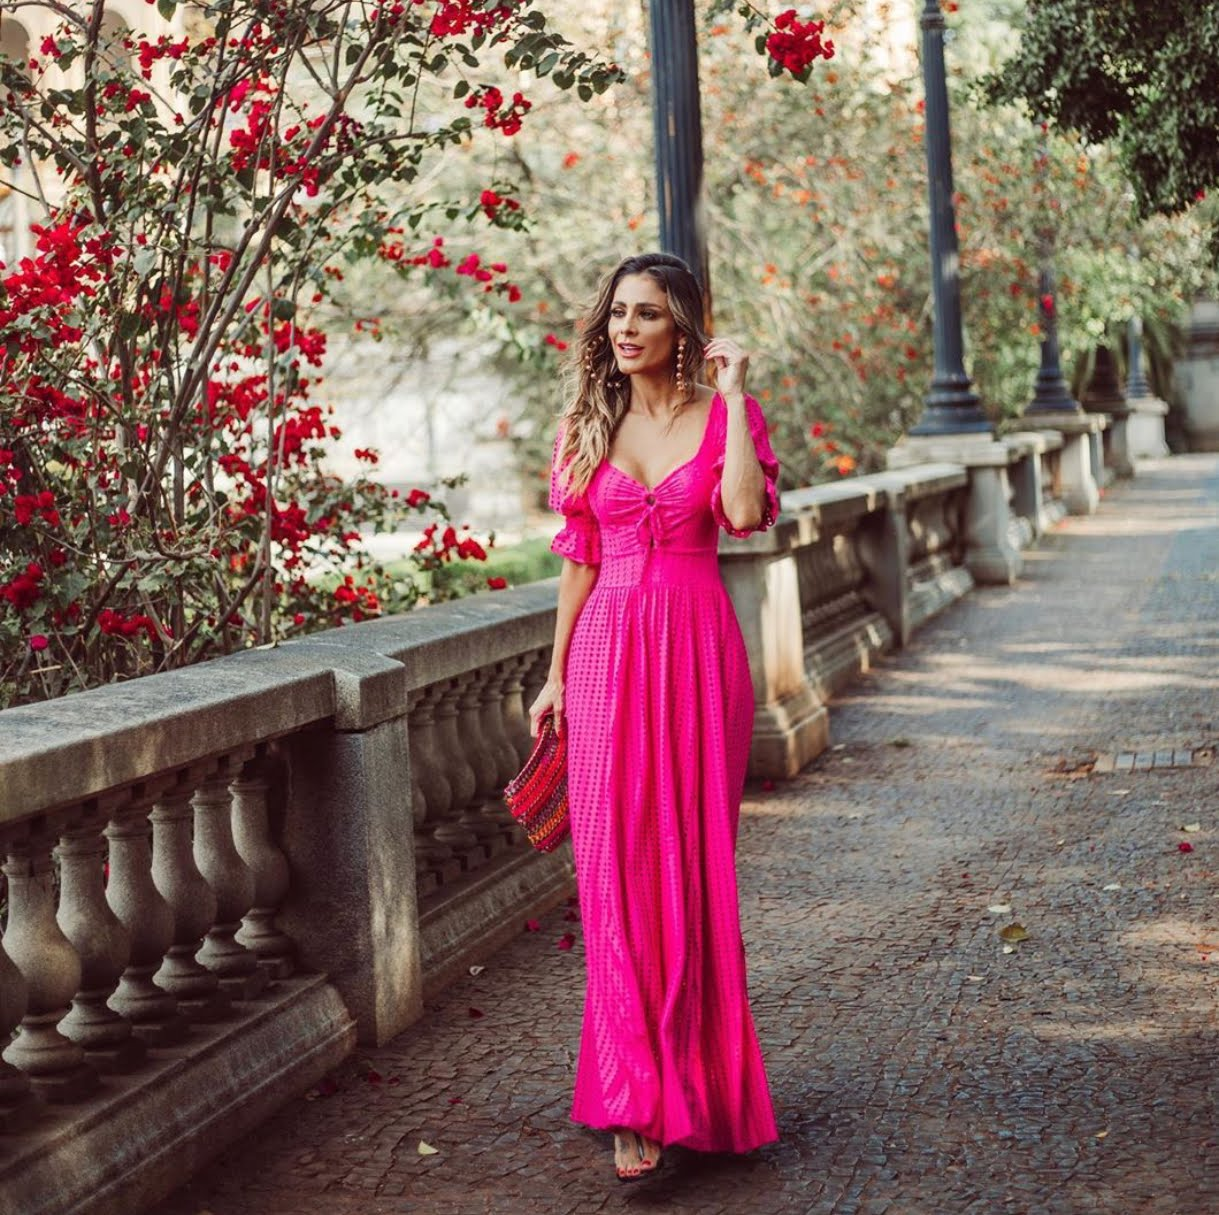 Vestido longo princesa em laise mangas bufantes cor pink.